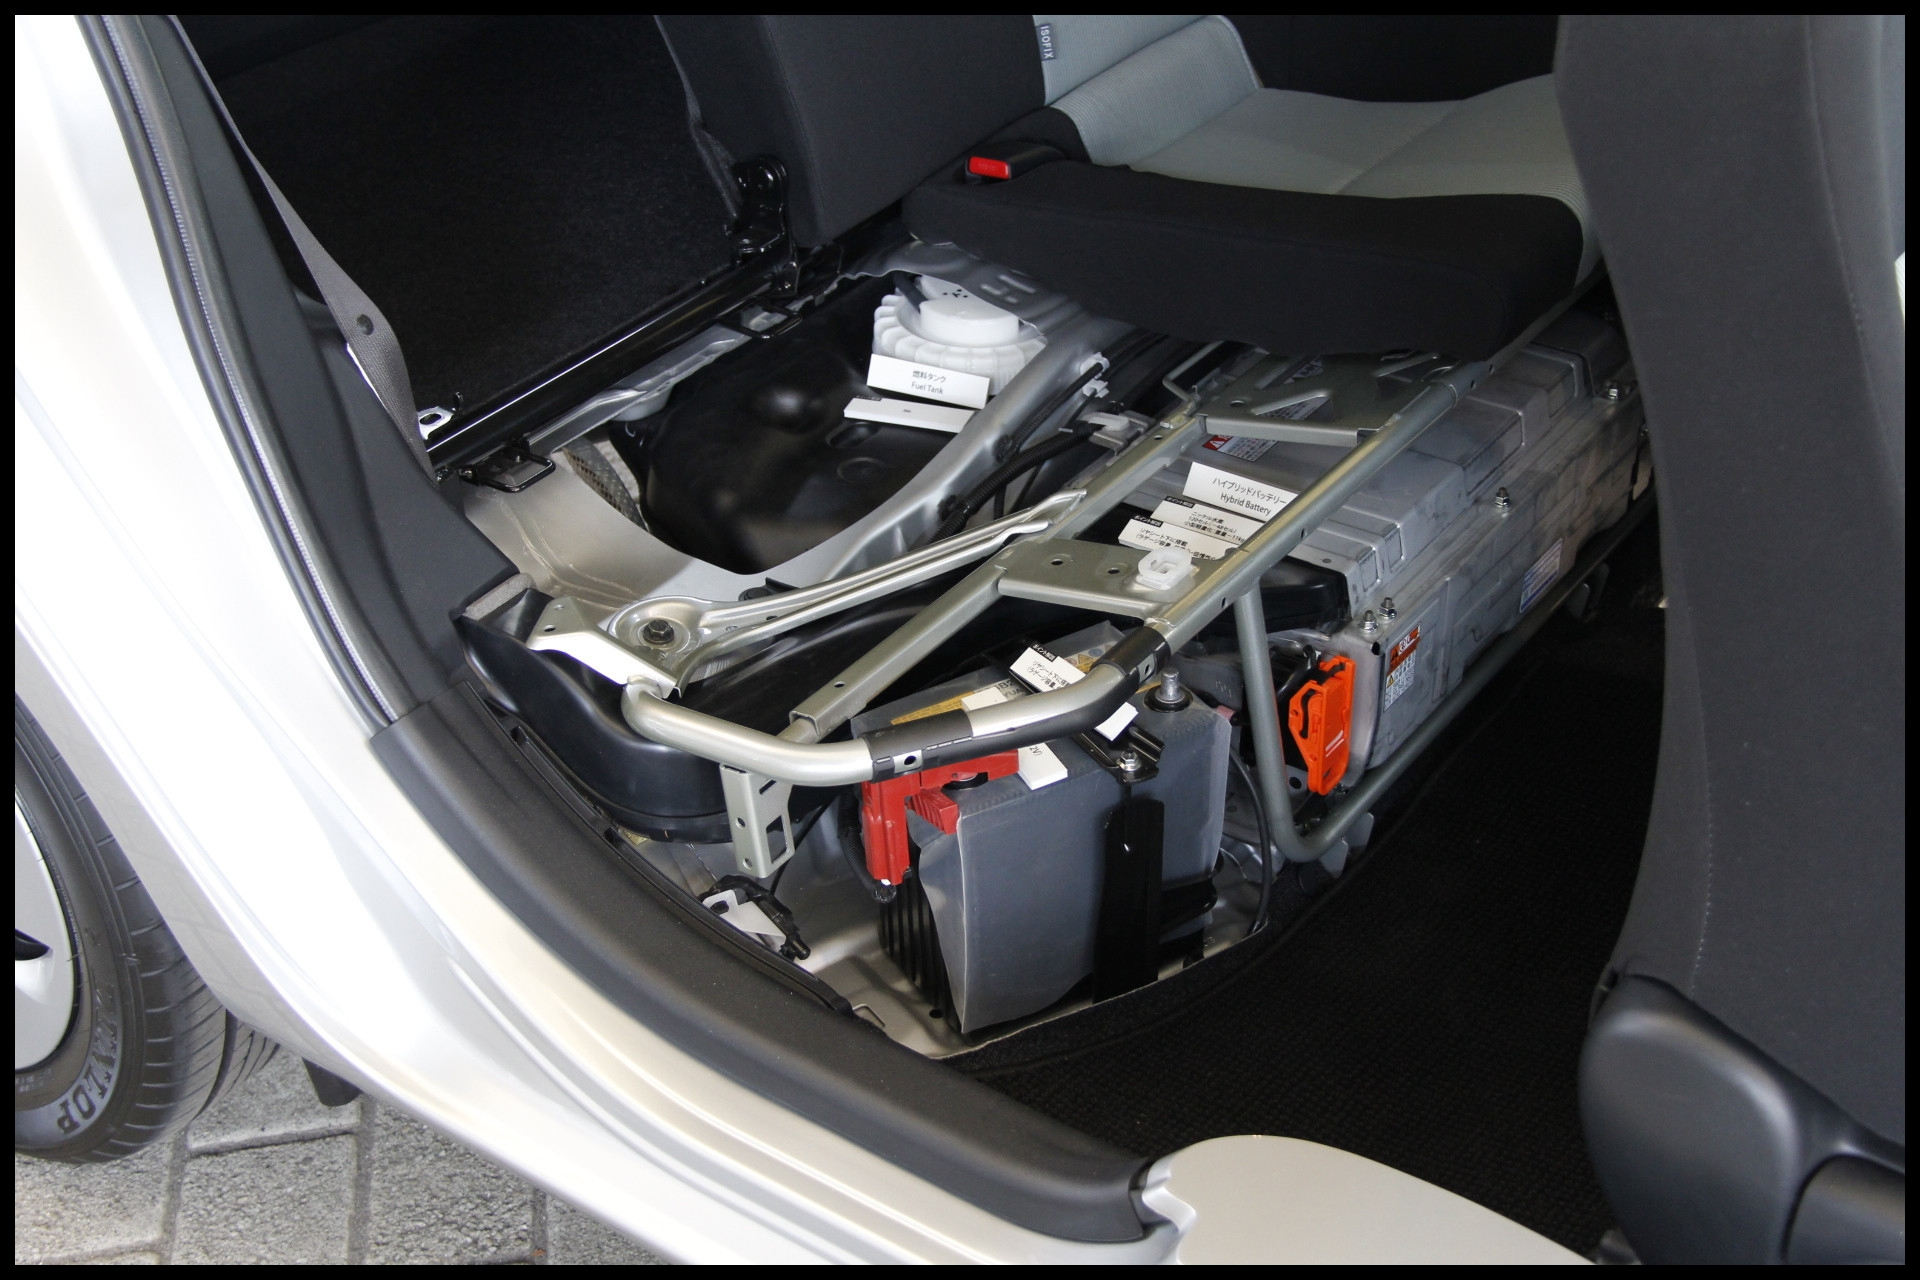 2014 toyota Prius Battery Unique Best 2014 toyota Prius Battery